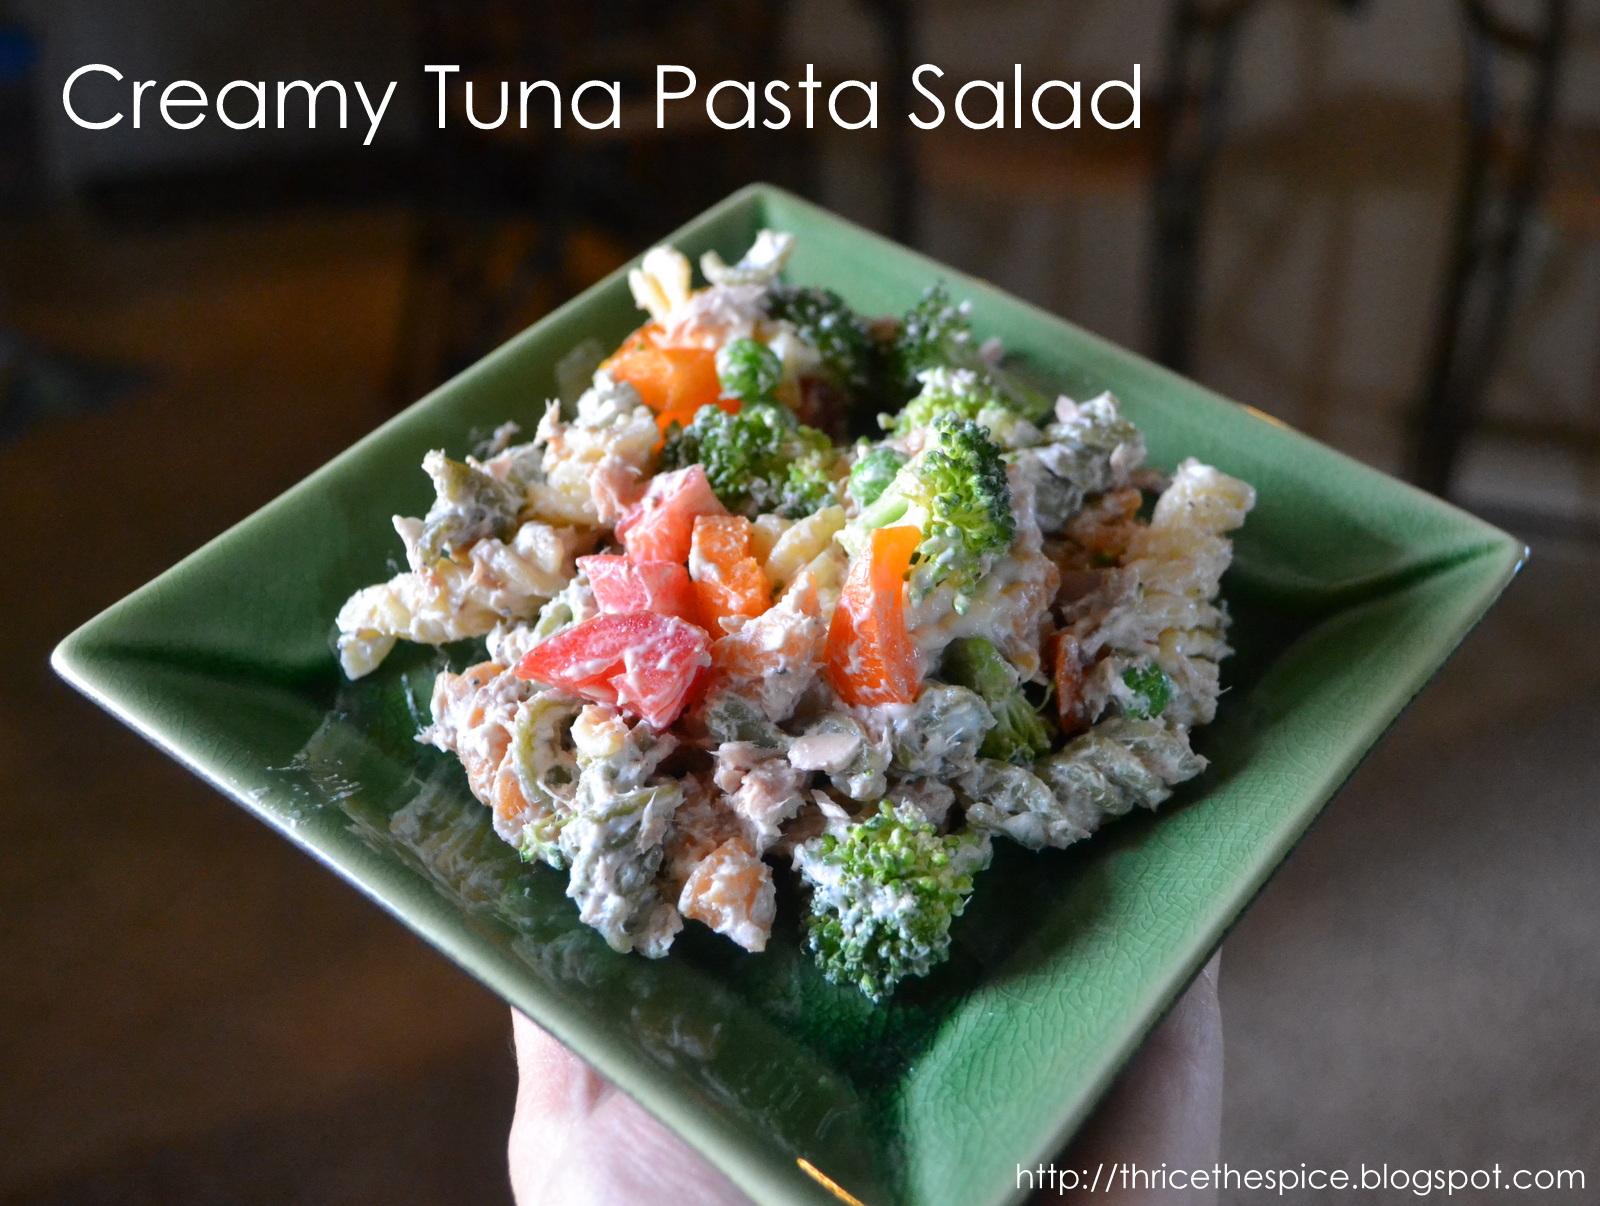 ThriceTheSpice: Creamy Tuna Pasta Salad